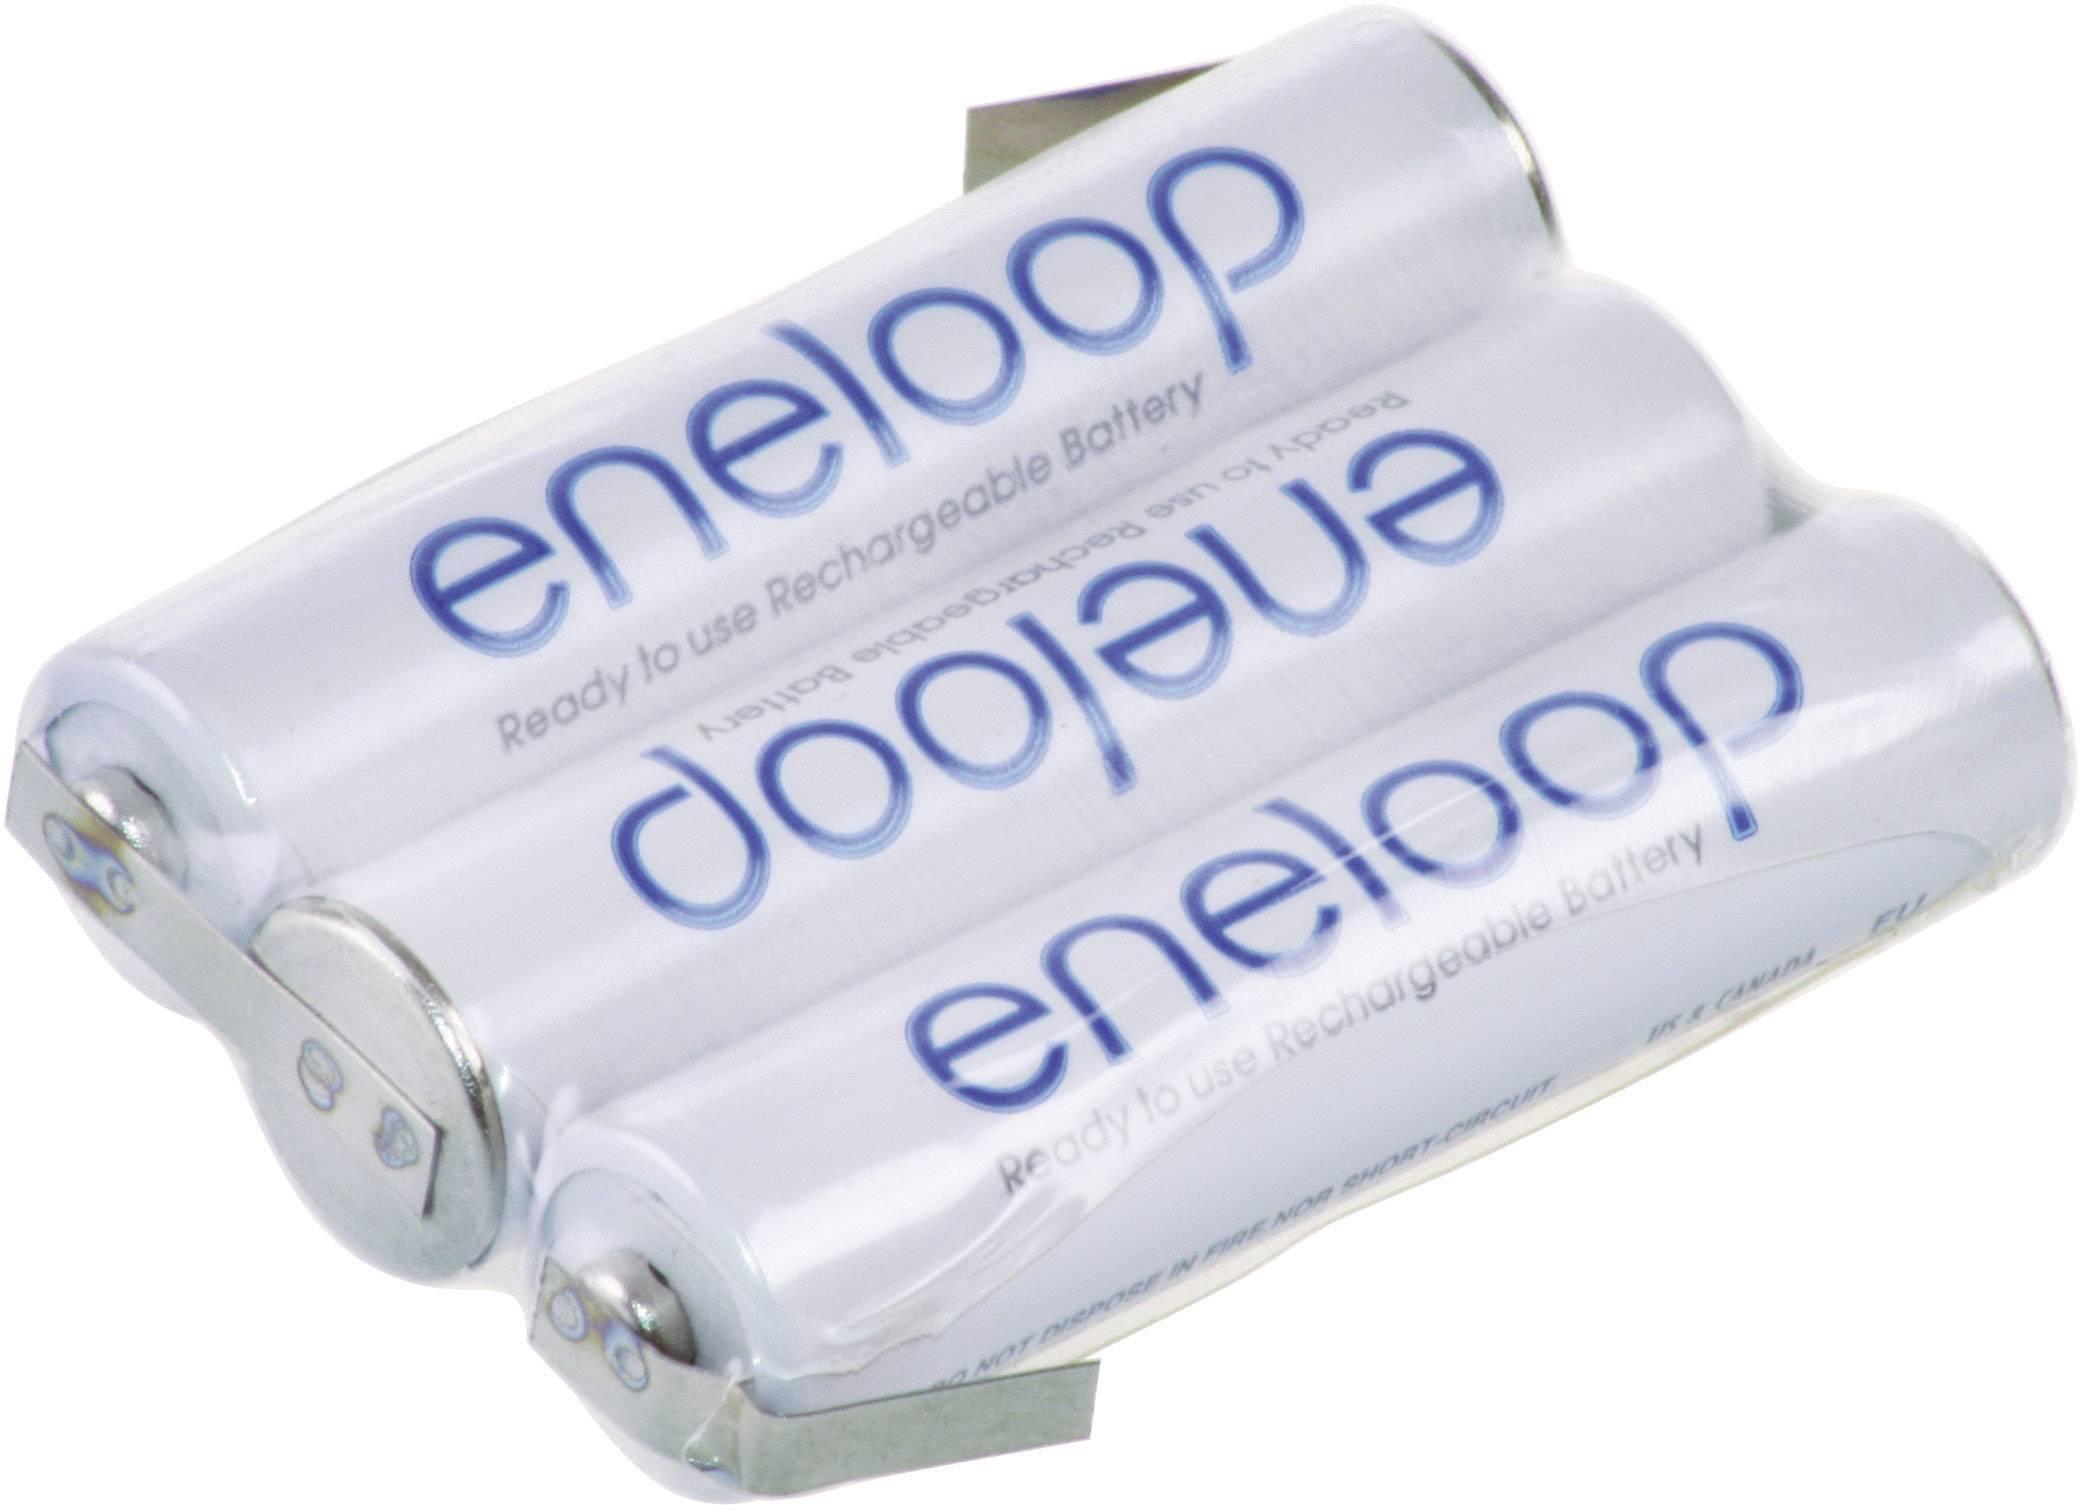 Akupack - sada nabíjacích batérií NiMH 3 micro (AAA) Panasonic eneloop Reihe F1x3 129674, 750 mAh, 3.6 V